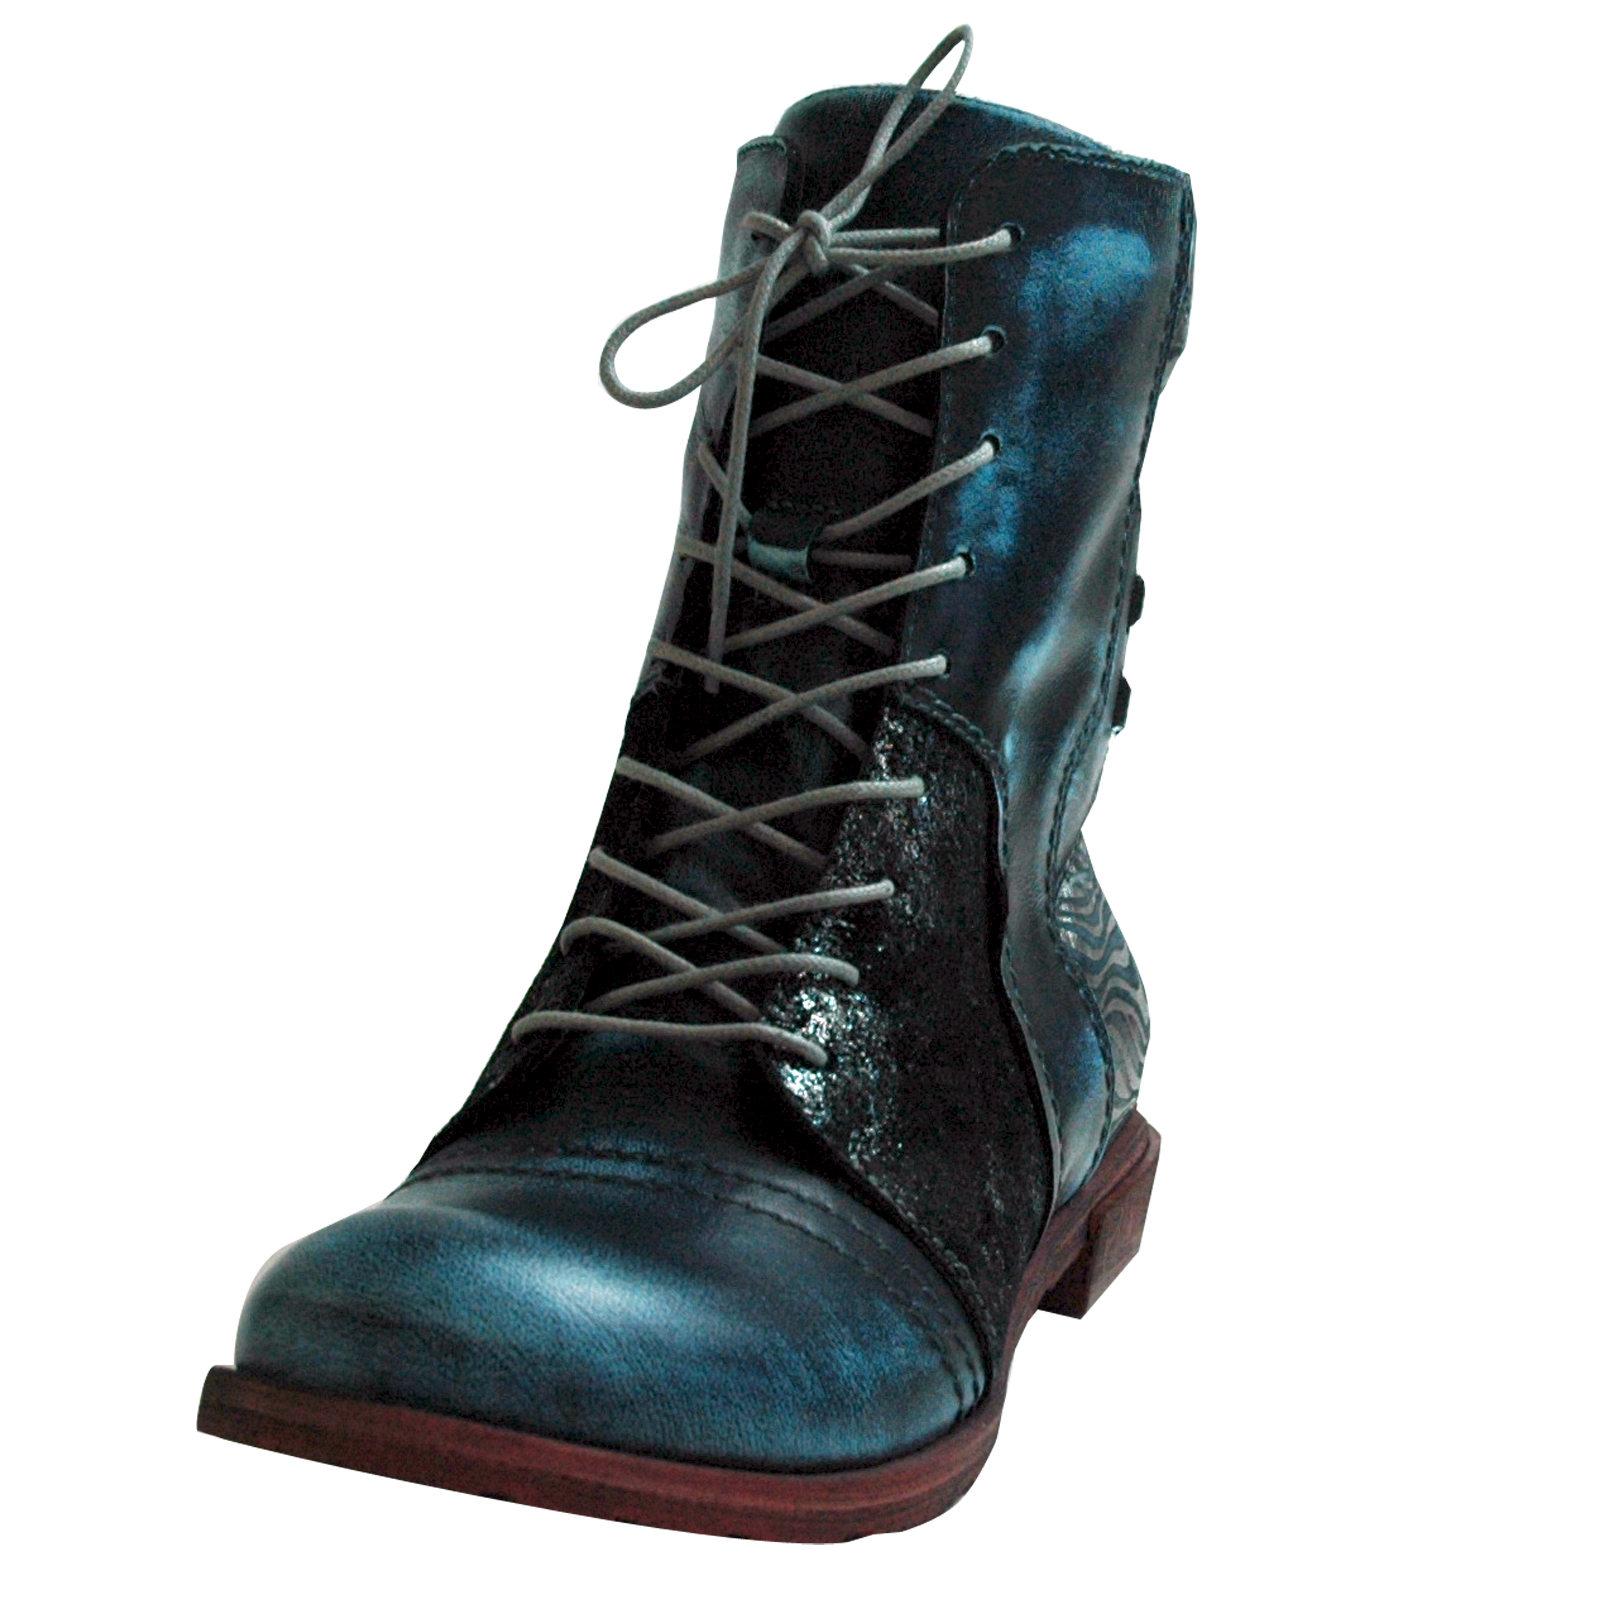 Simen Ladies Lace-Up Ankle Boots 9767